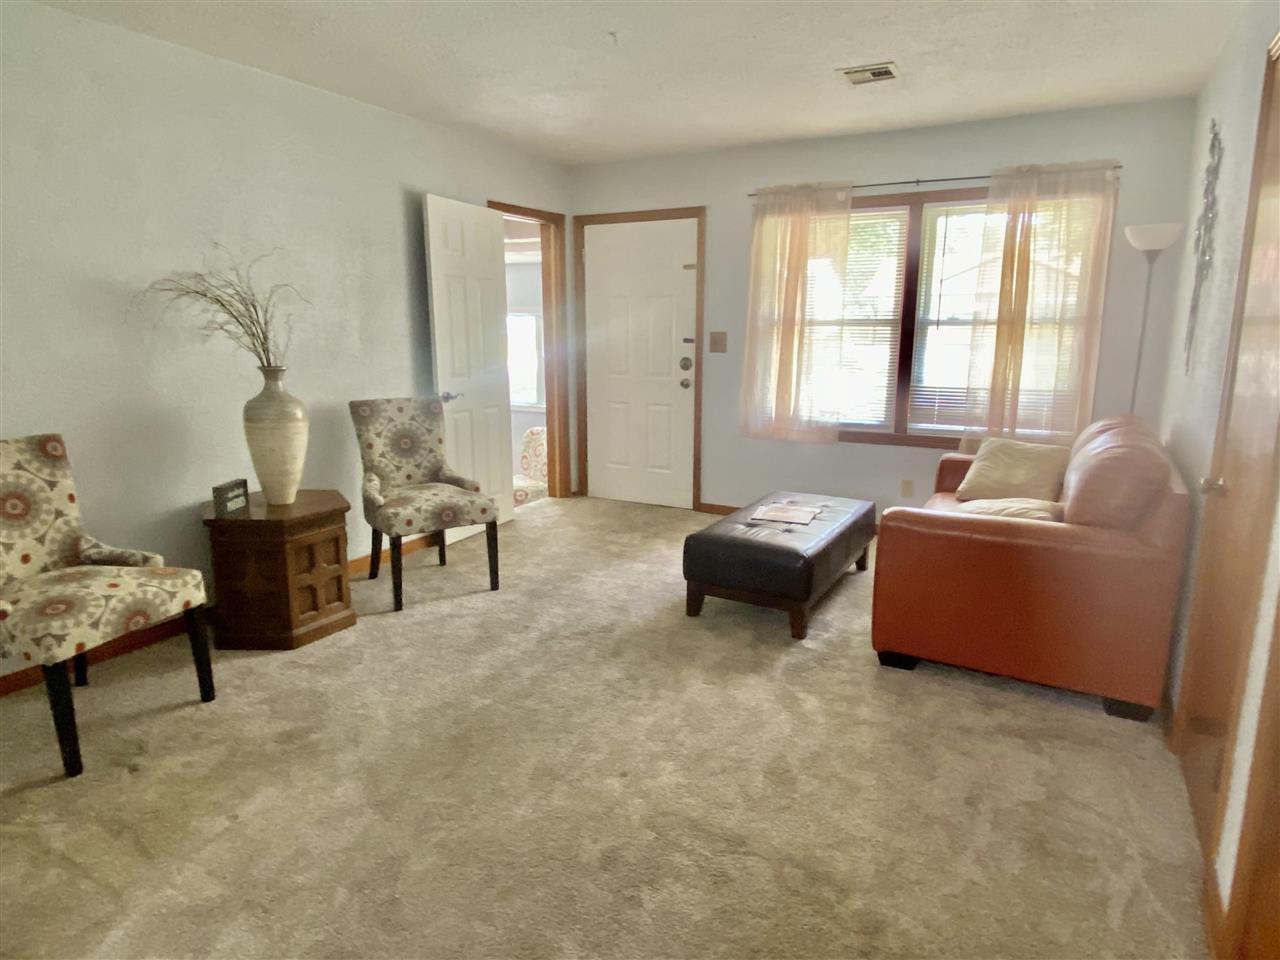 For Sale: 1851 S Ridgewood, Wichita KS